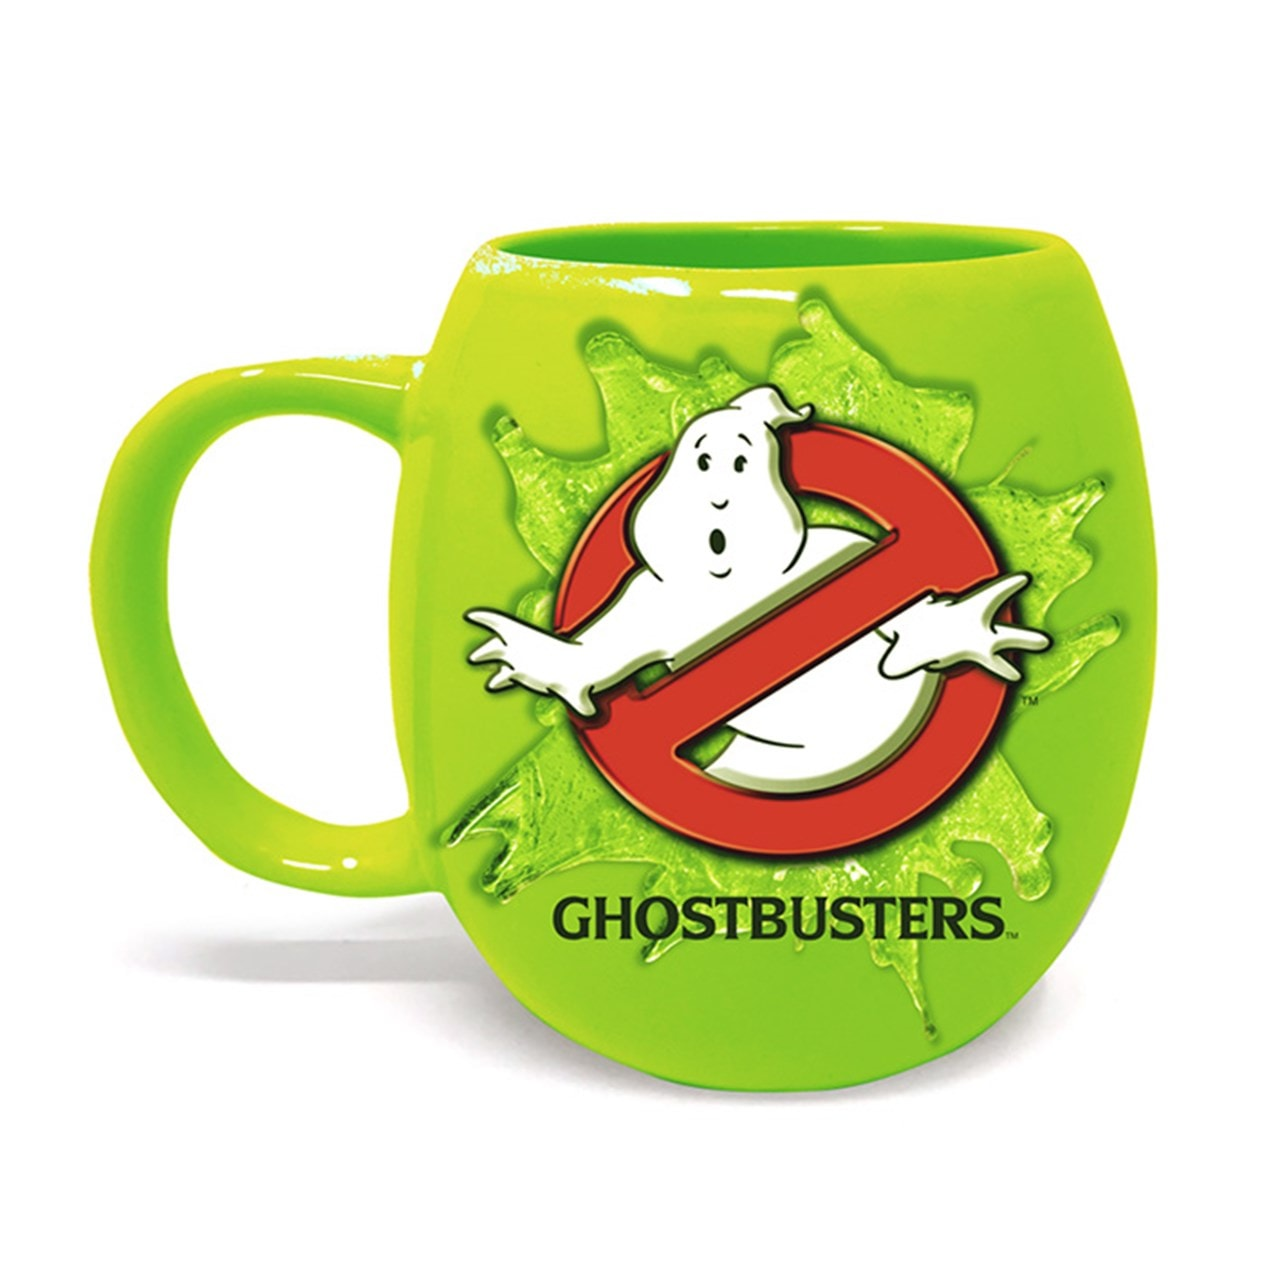 Ghostbusters: Slimer Mug - 2